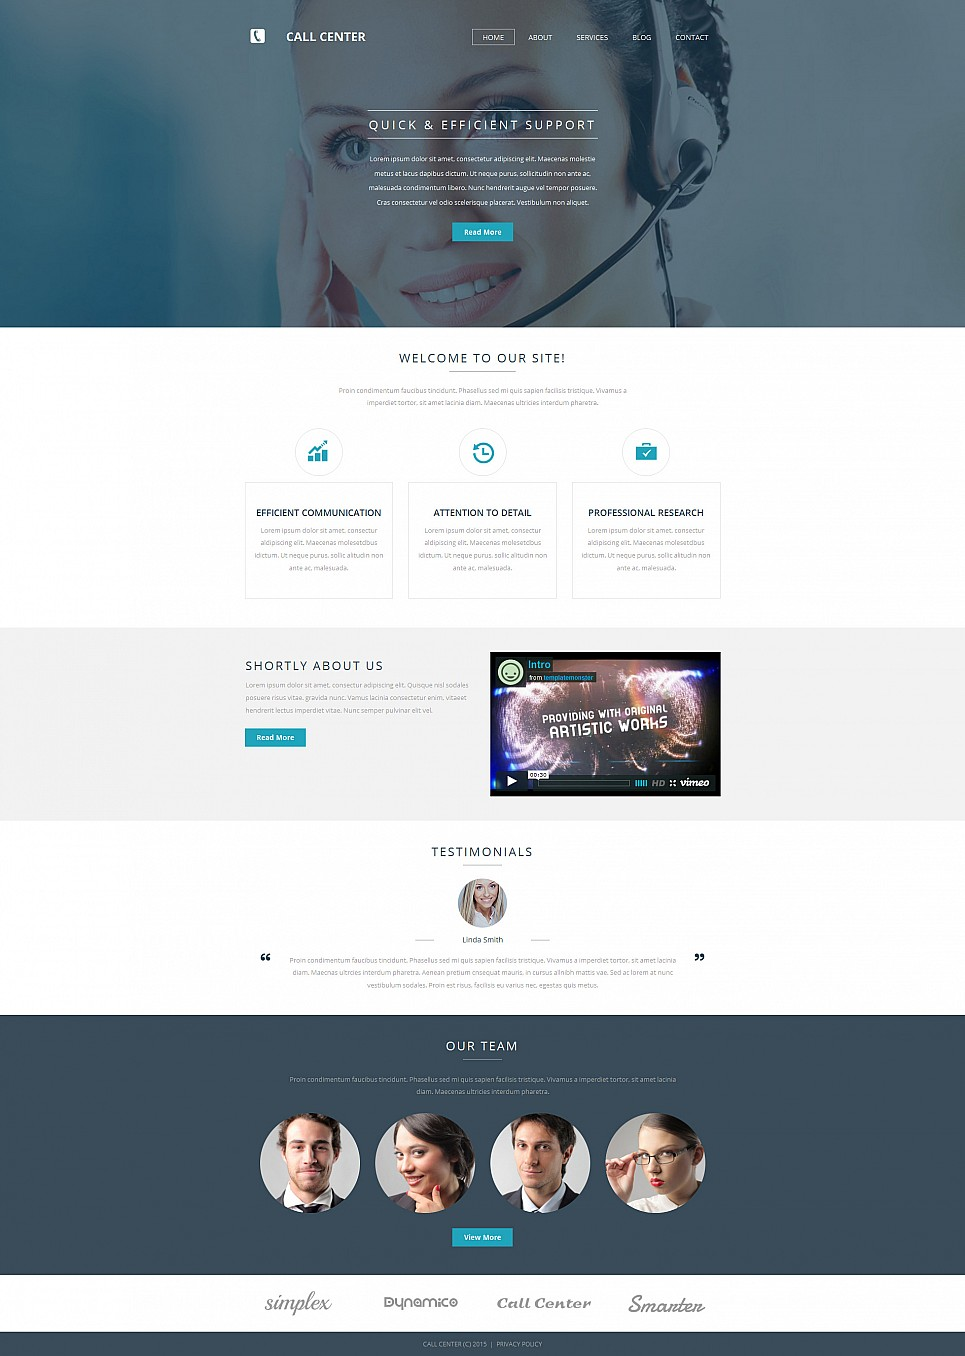 Online Call Center Website Theme - image